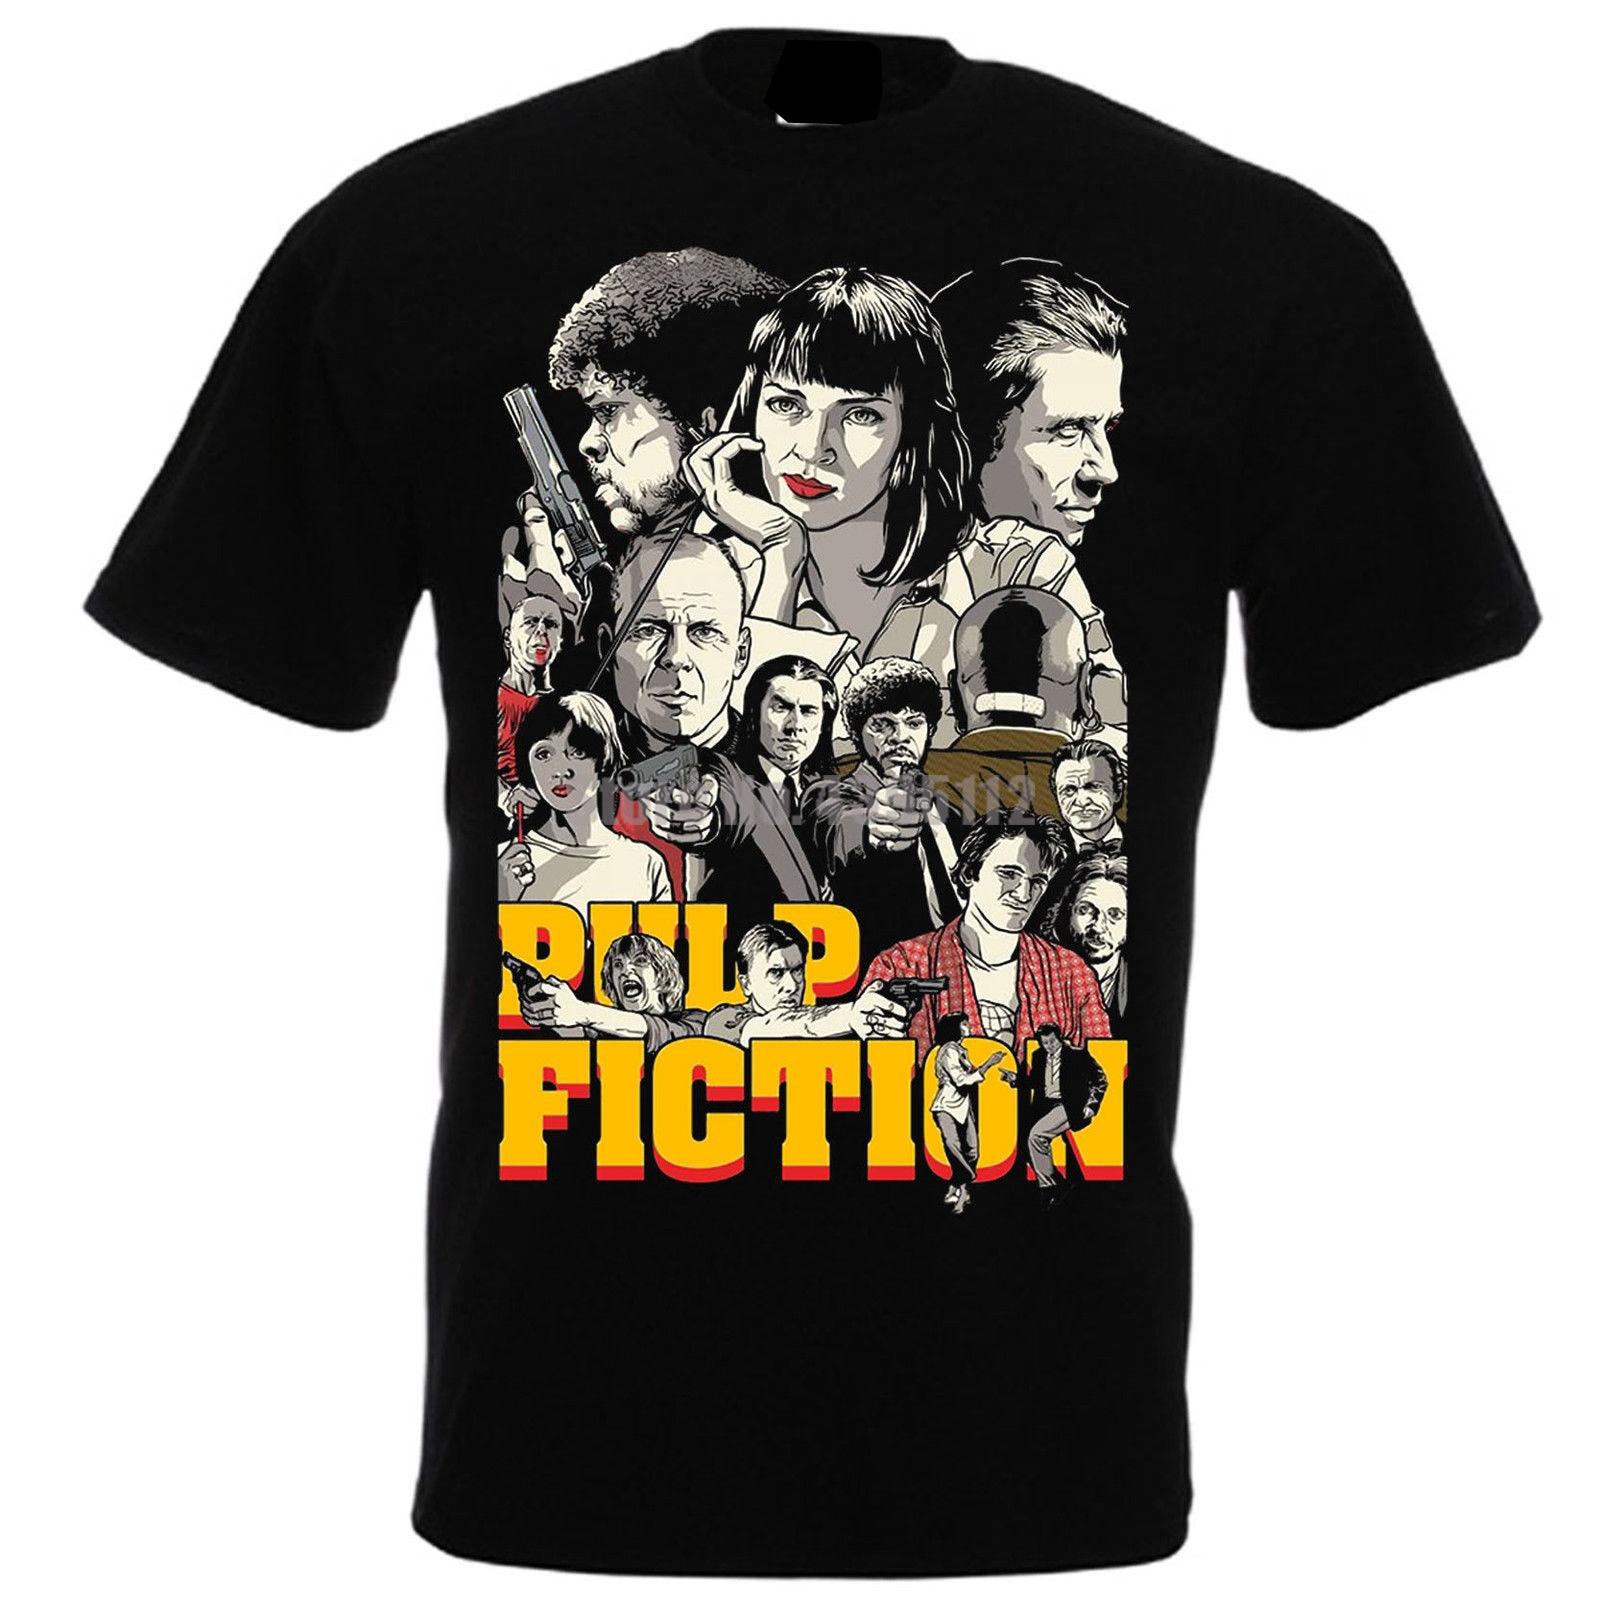 Quentin Tarantino '94 John Travolta Samuel L Jackson Femmes футболка Японская уличная одежда футболки тренажерный зал Футболка черный и белый